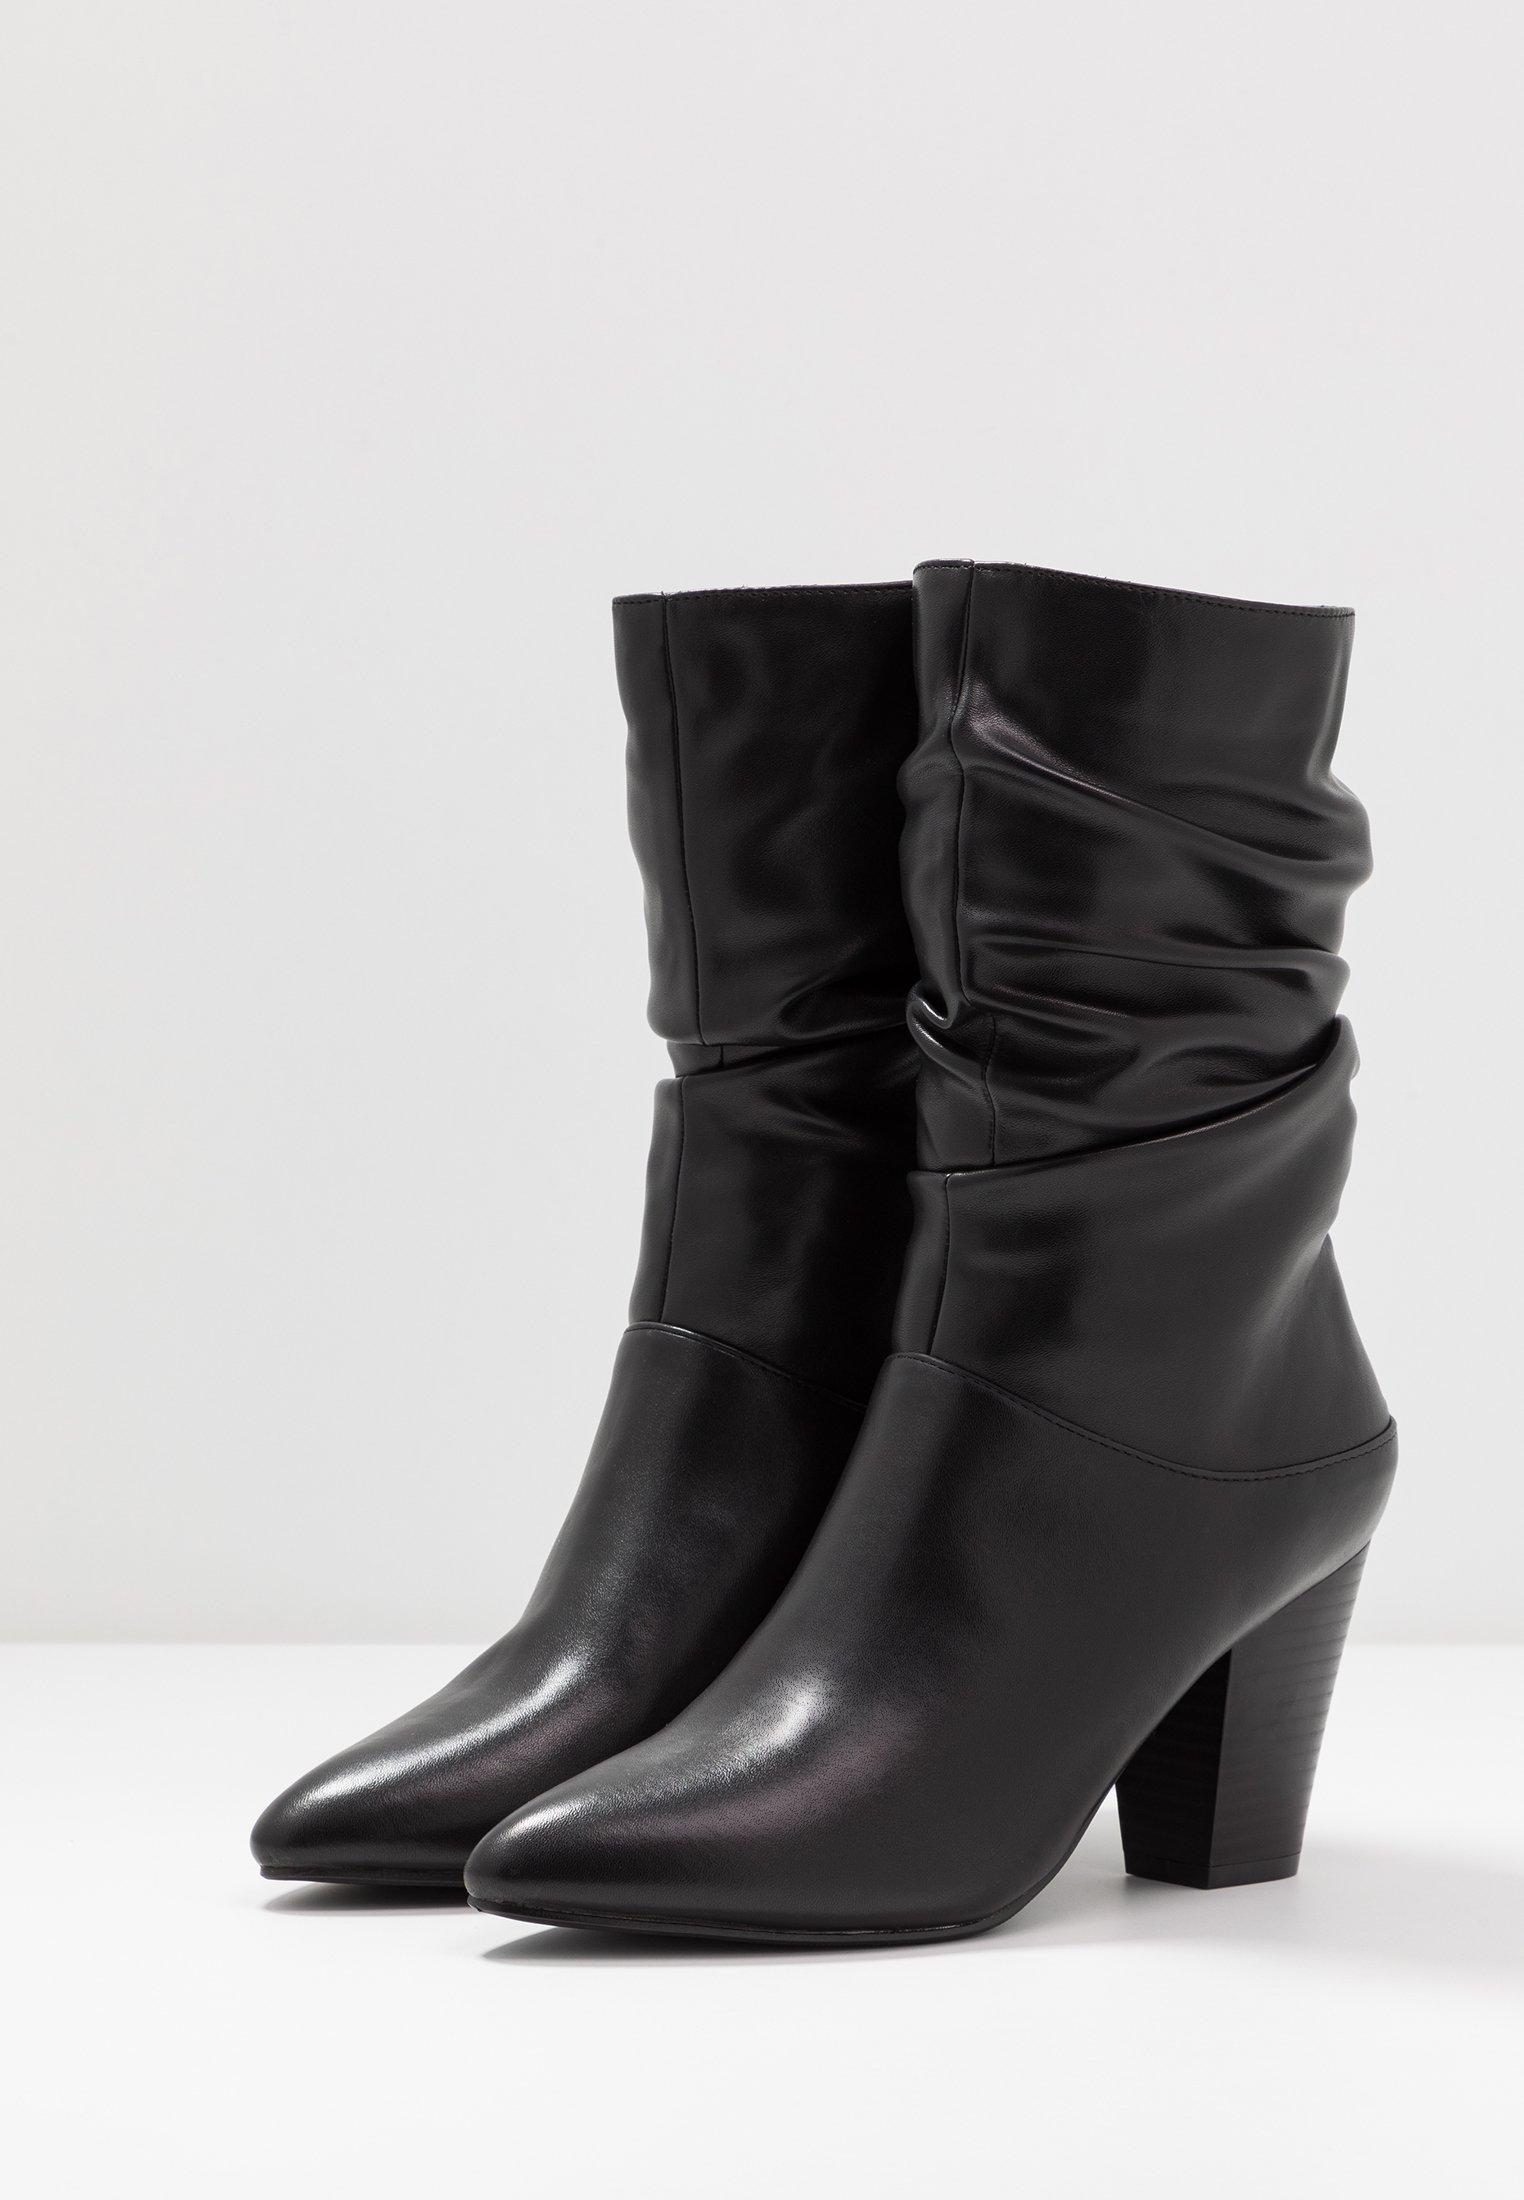 4th & Reckless BLANE - Ankelboots med høye hæler - black